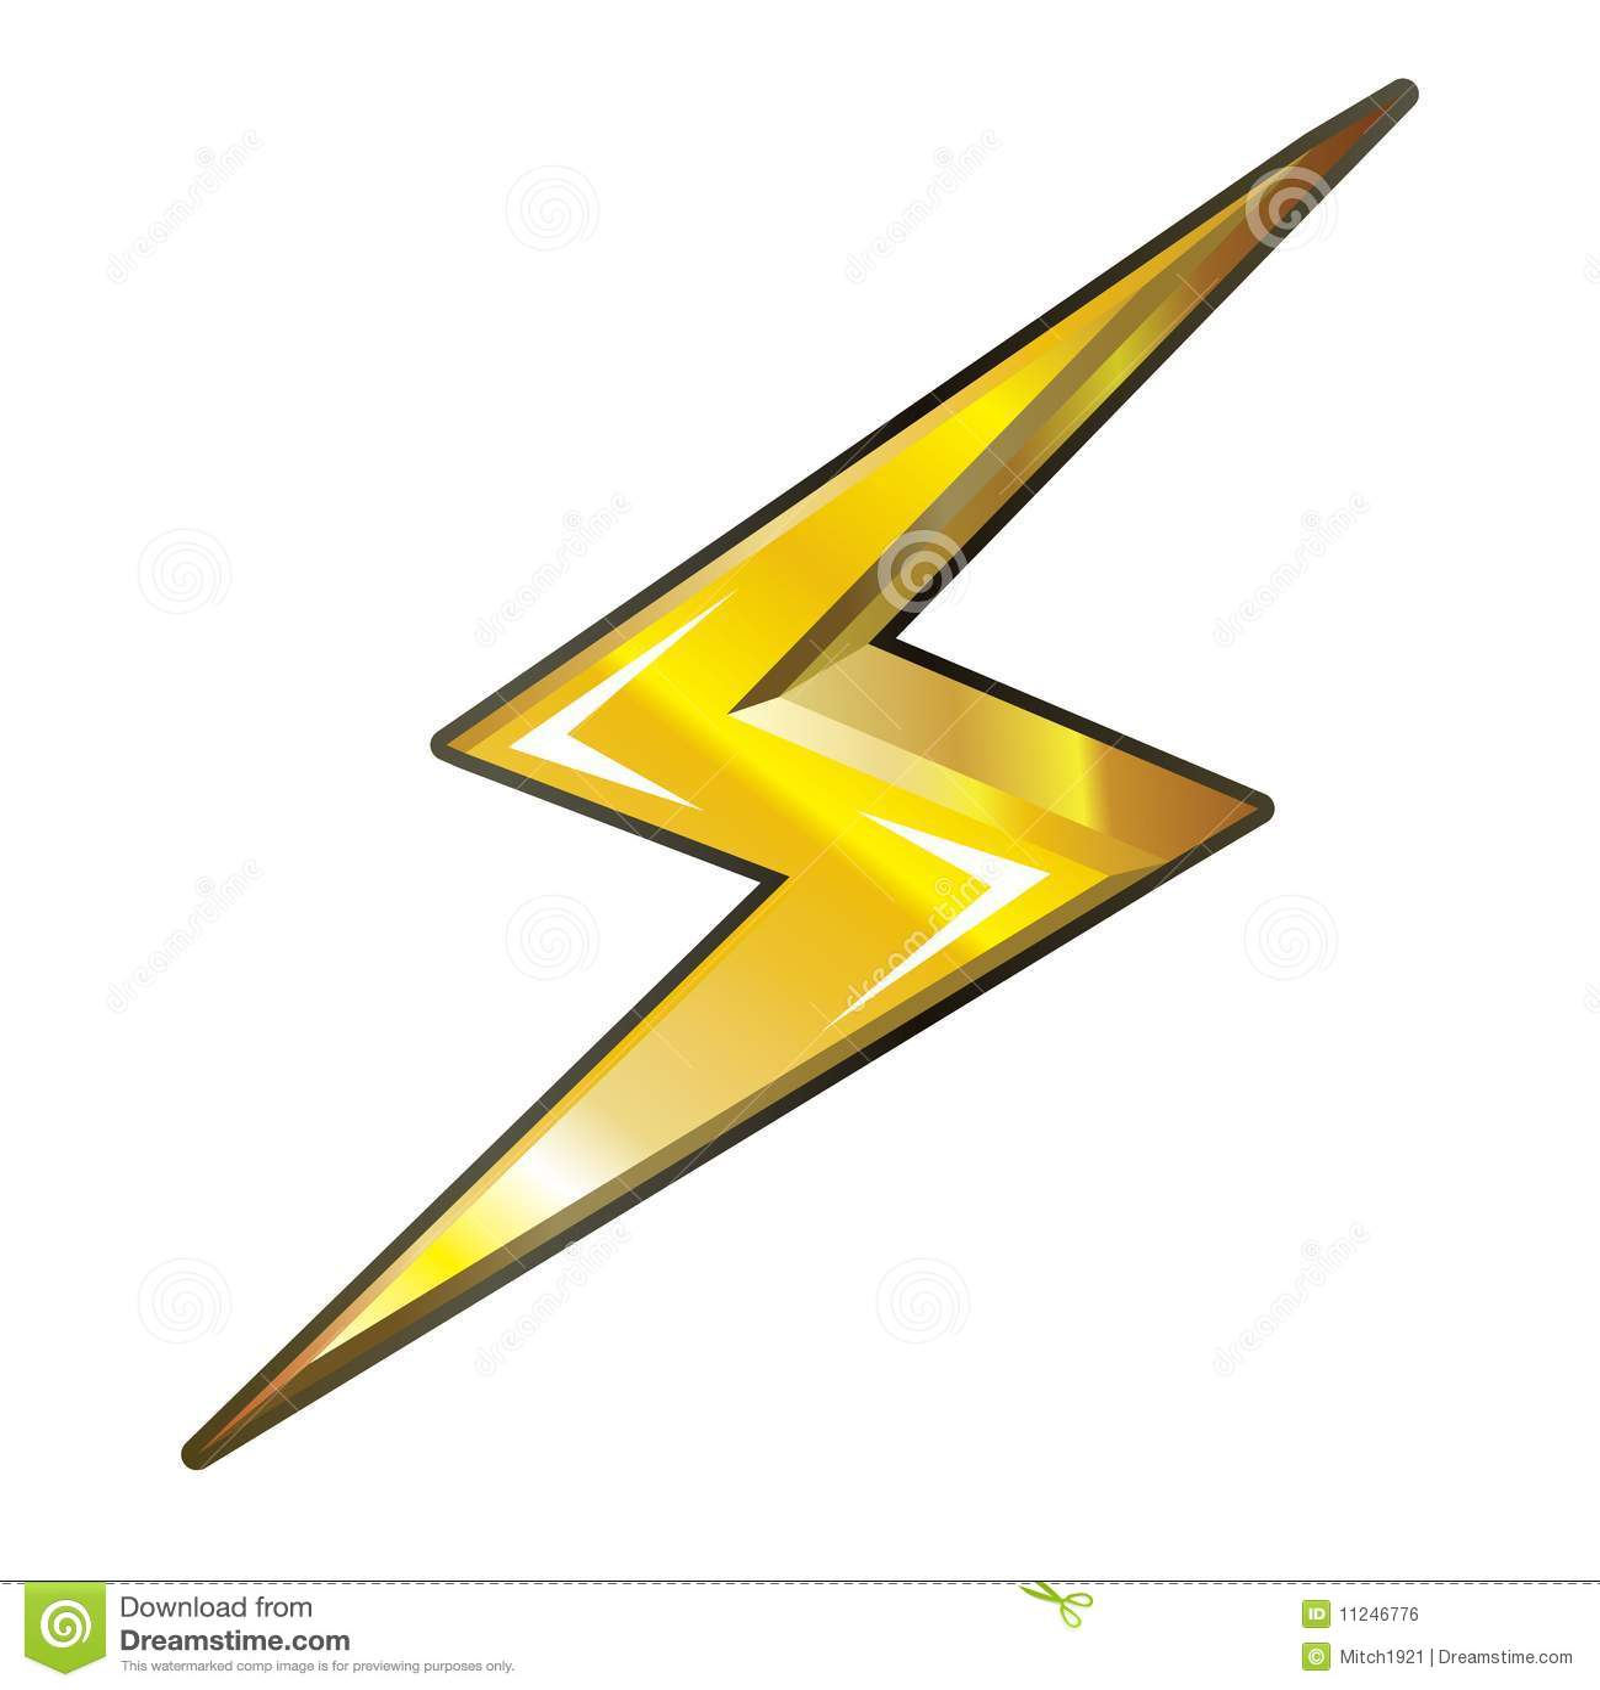 power icon royalty free stock image image 11246776 lightning bolt vector file lightning bolt vector art